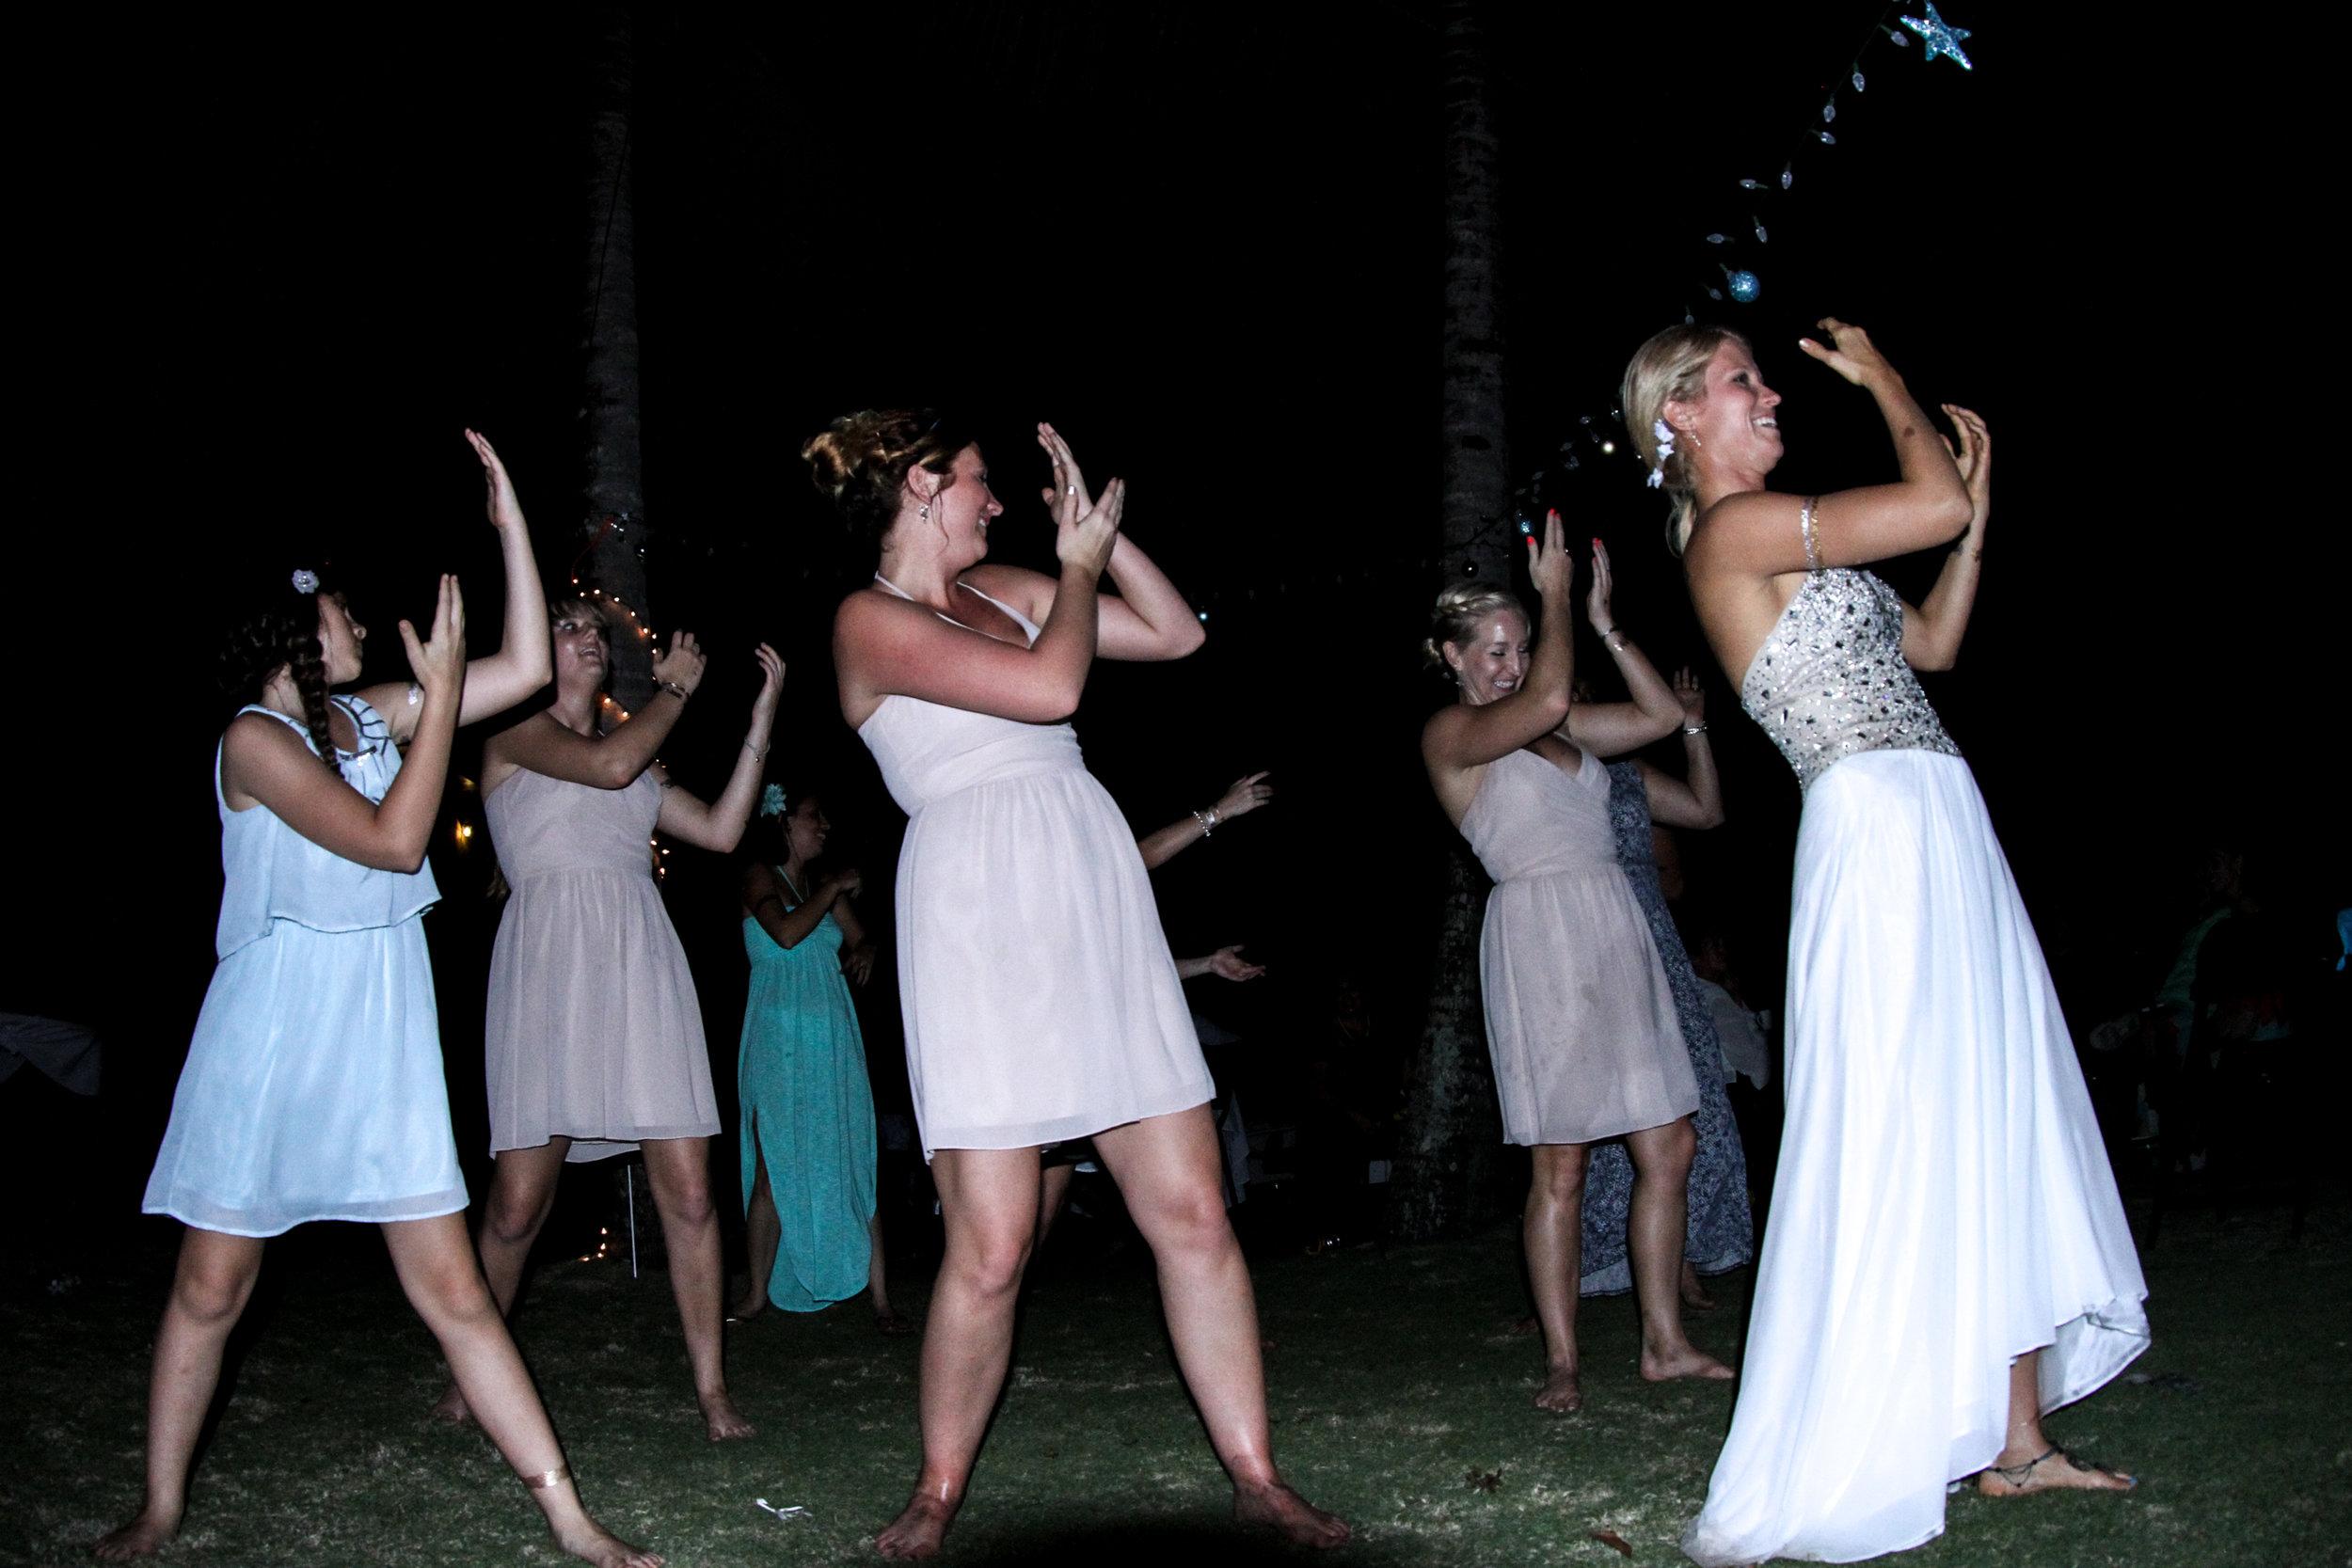 sandra.derek.wedding.best (66 of 67).jpg